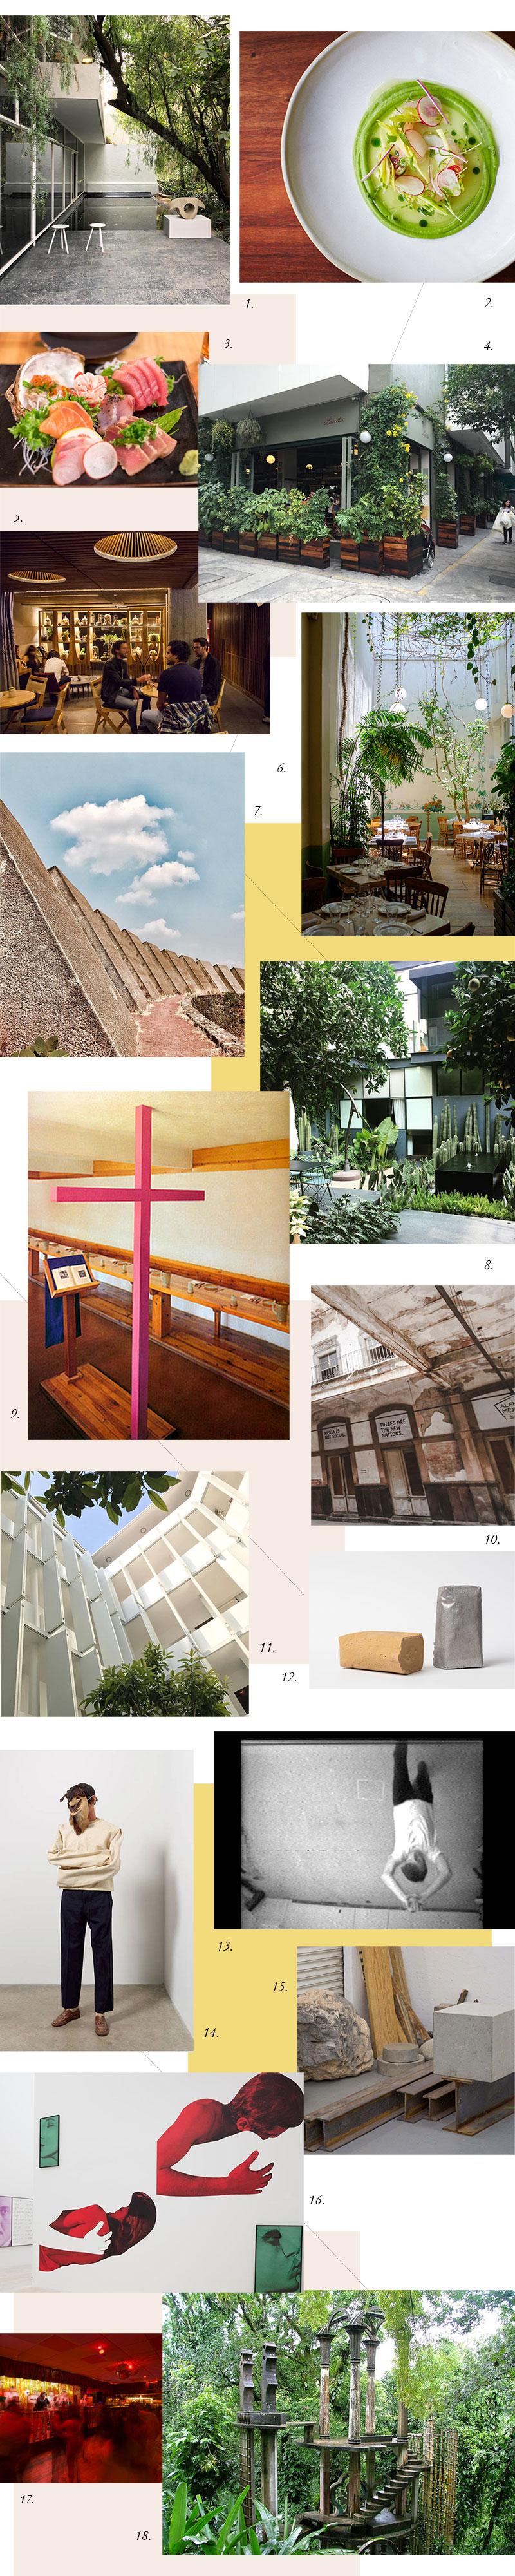 collecteurs-mexico-city-guide.jpg